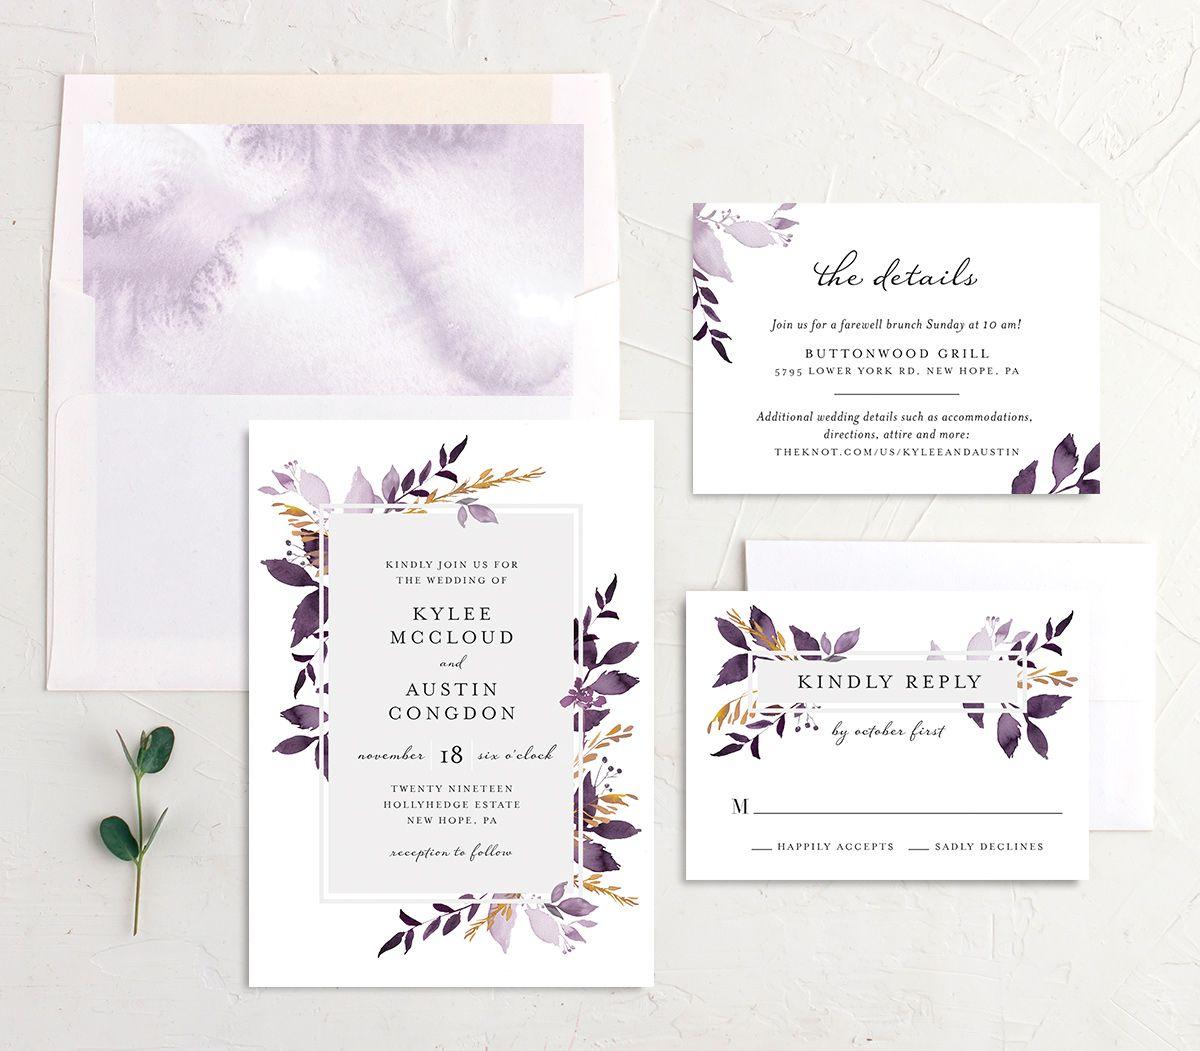 leafy frame wedding invitations the knot leafy frame wedding invitations the knot